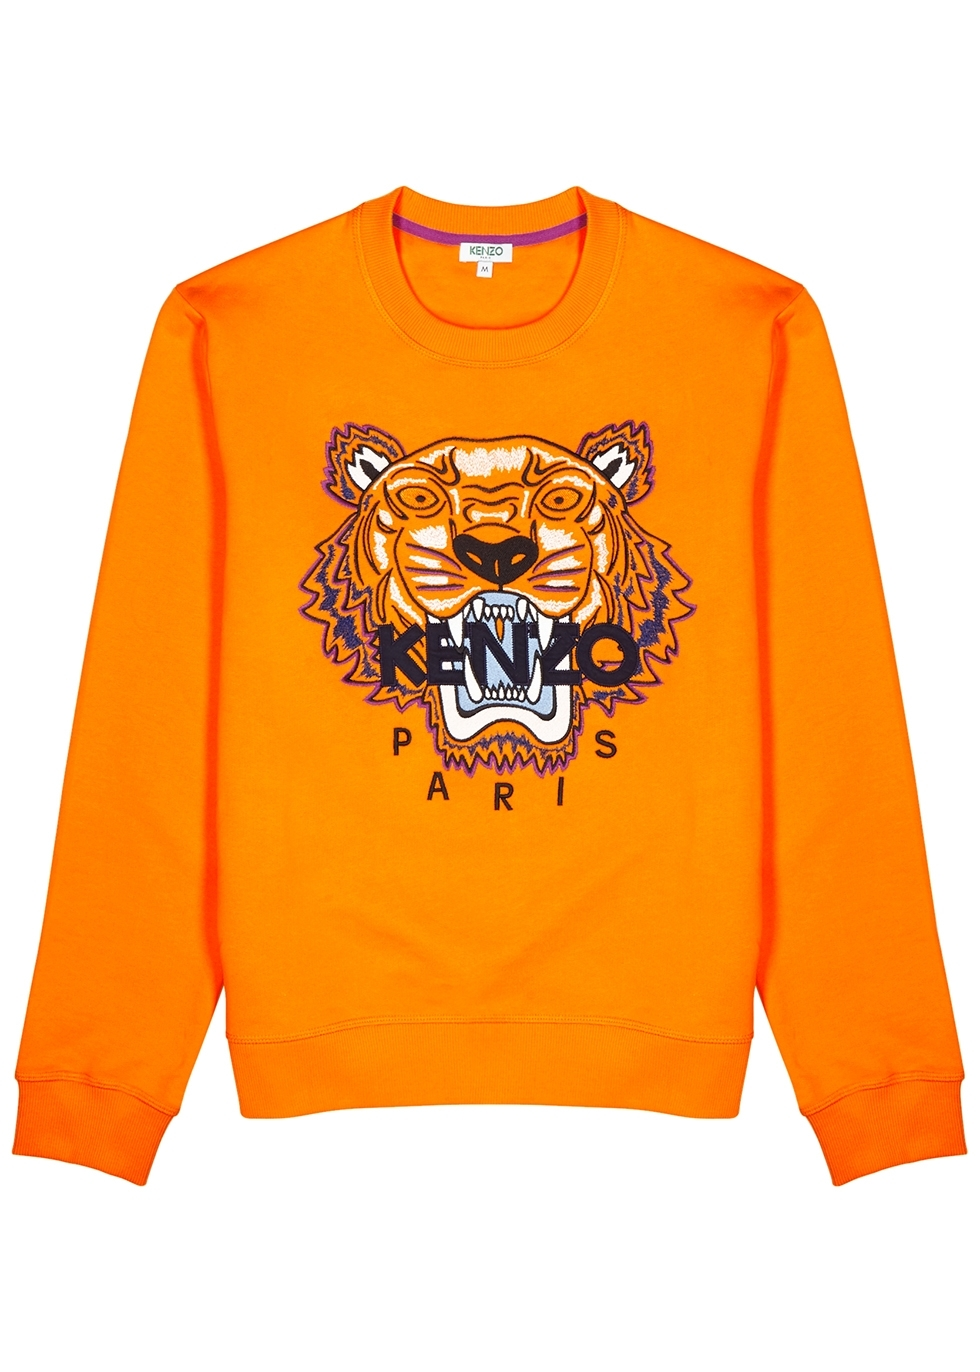 eed74492 Kenzo - Designer Sweatshirts, T-Shirts, Bags - Harvey Nichols